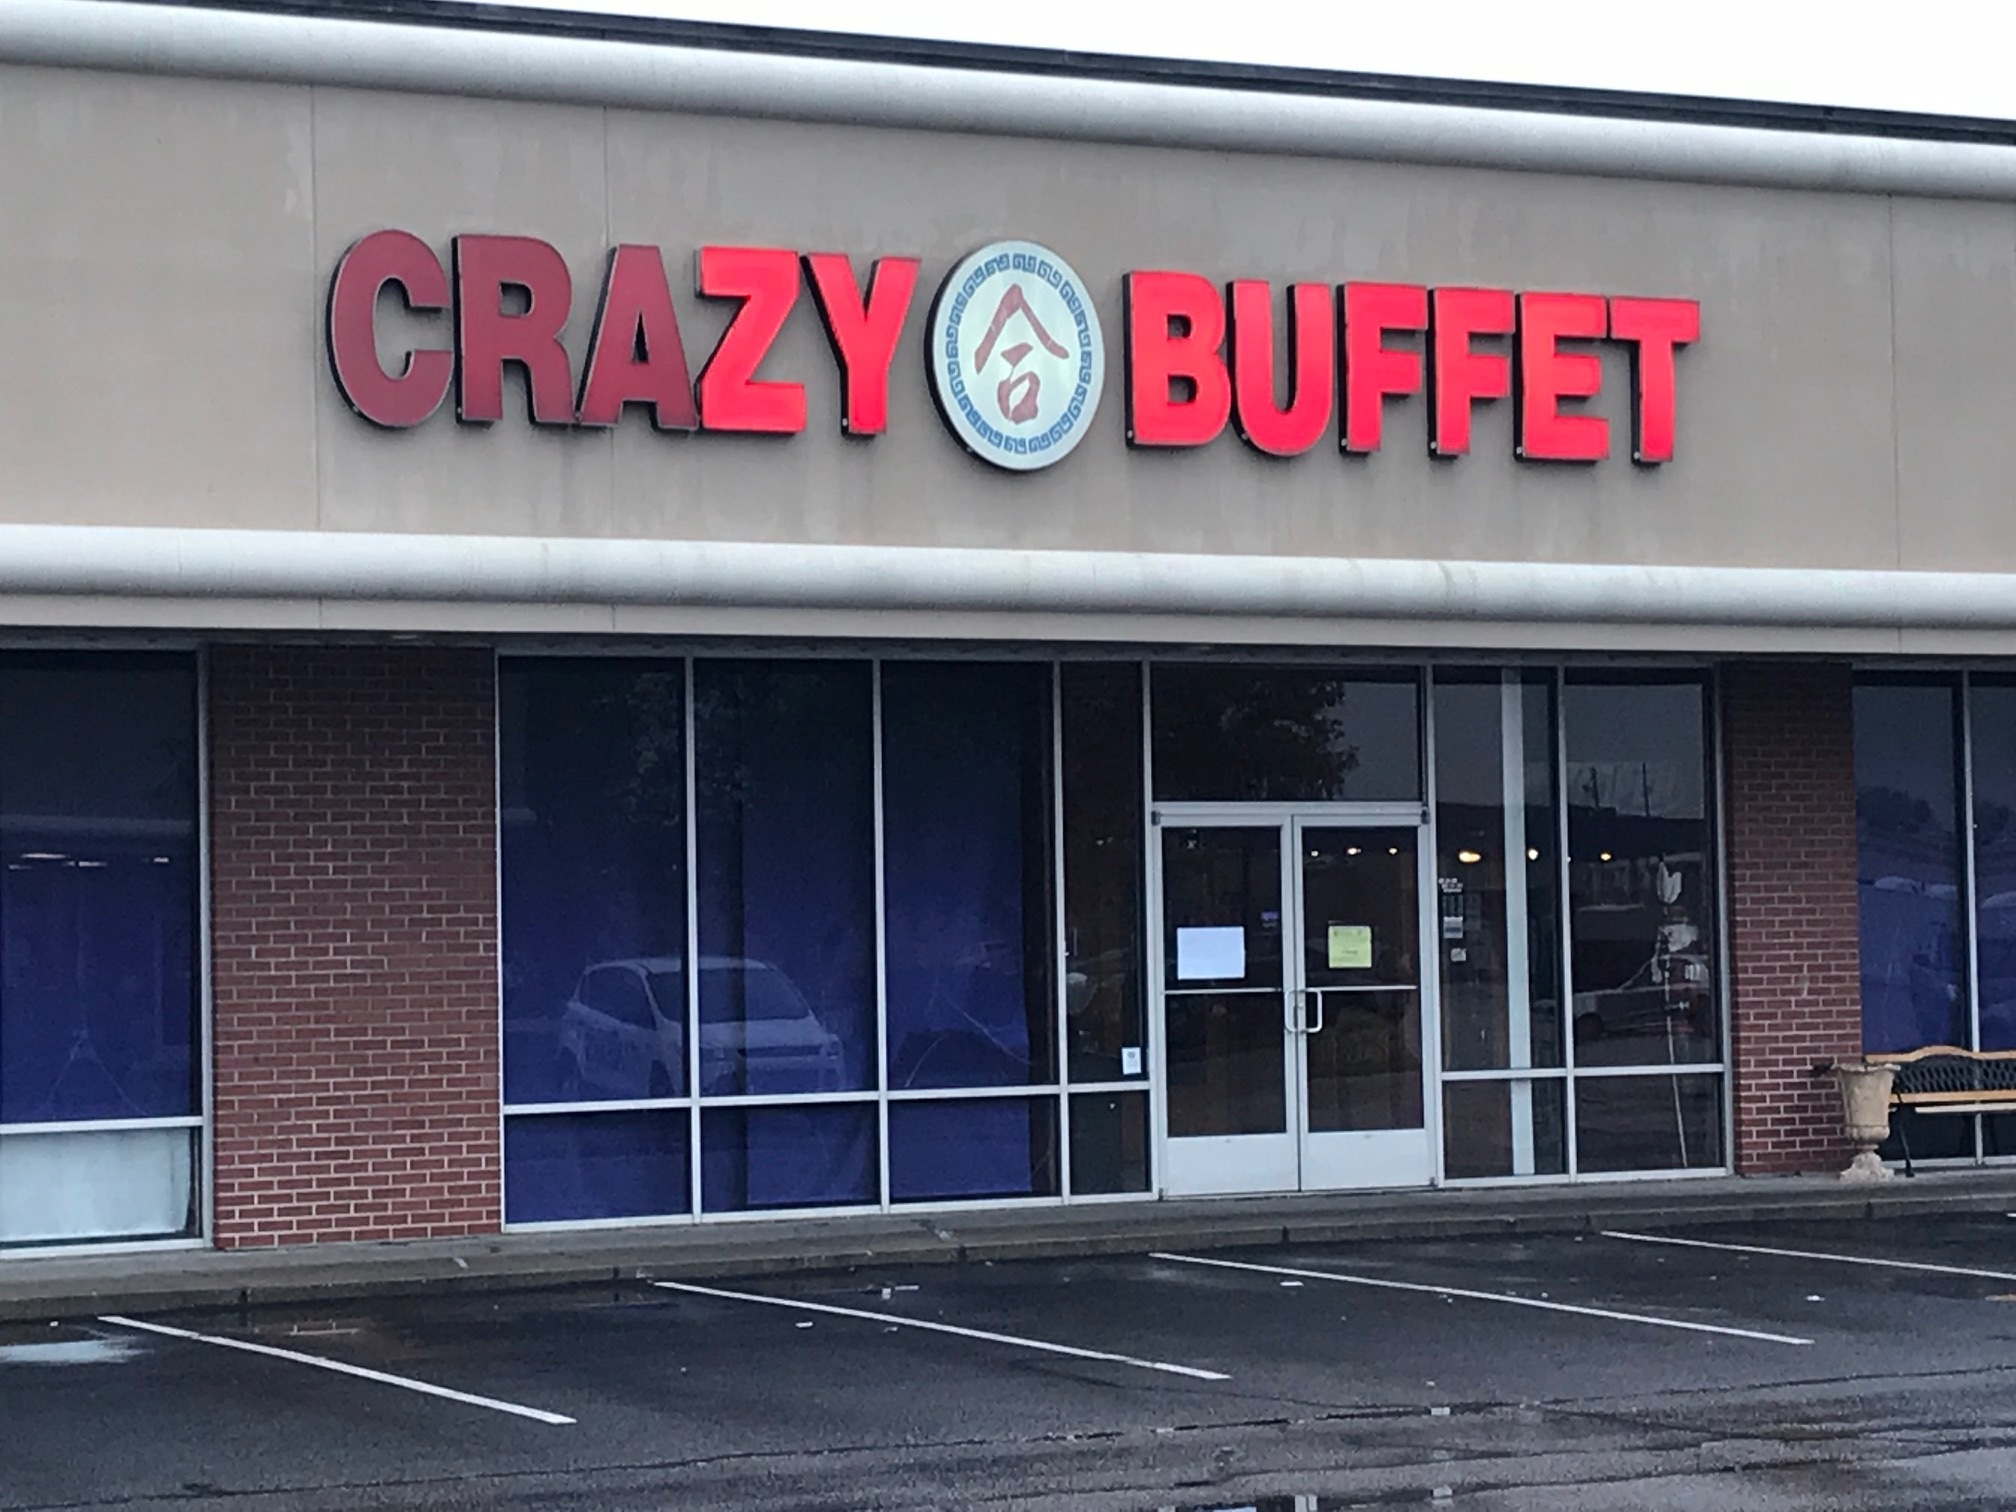 crazy buffet violations close business news 104 1 wiky rh wiky com crazy buffet 2 evansville indiana crazy buffet evansville indiana health department